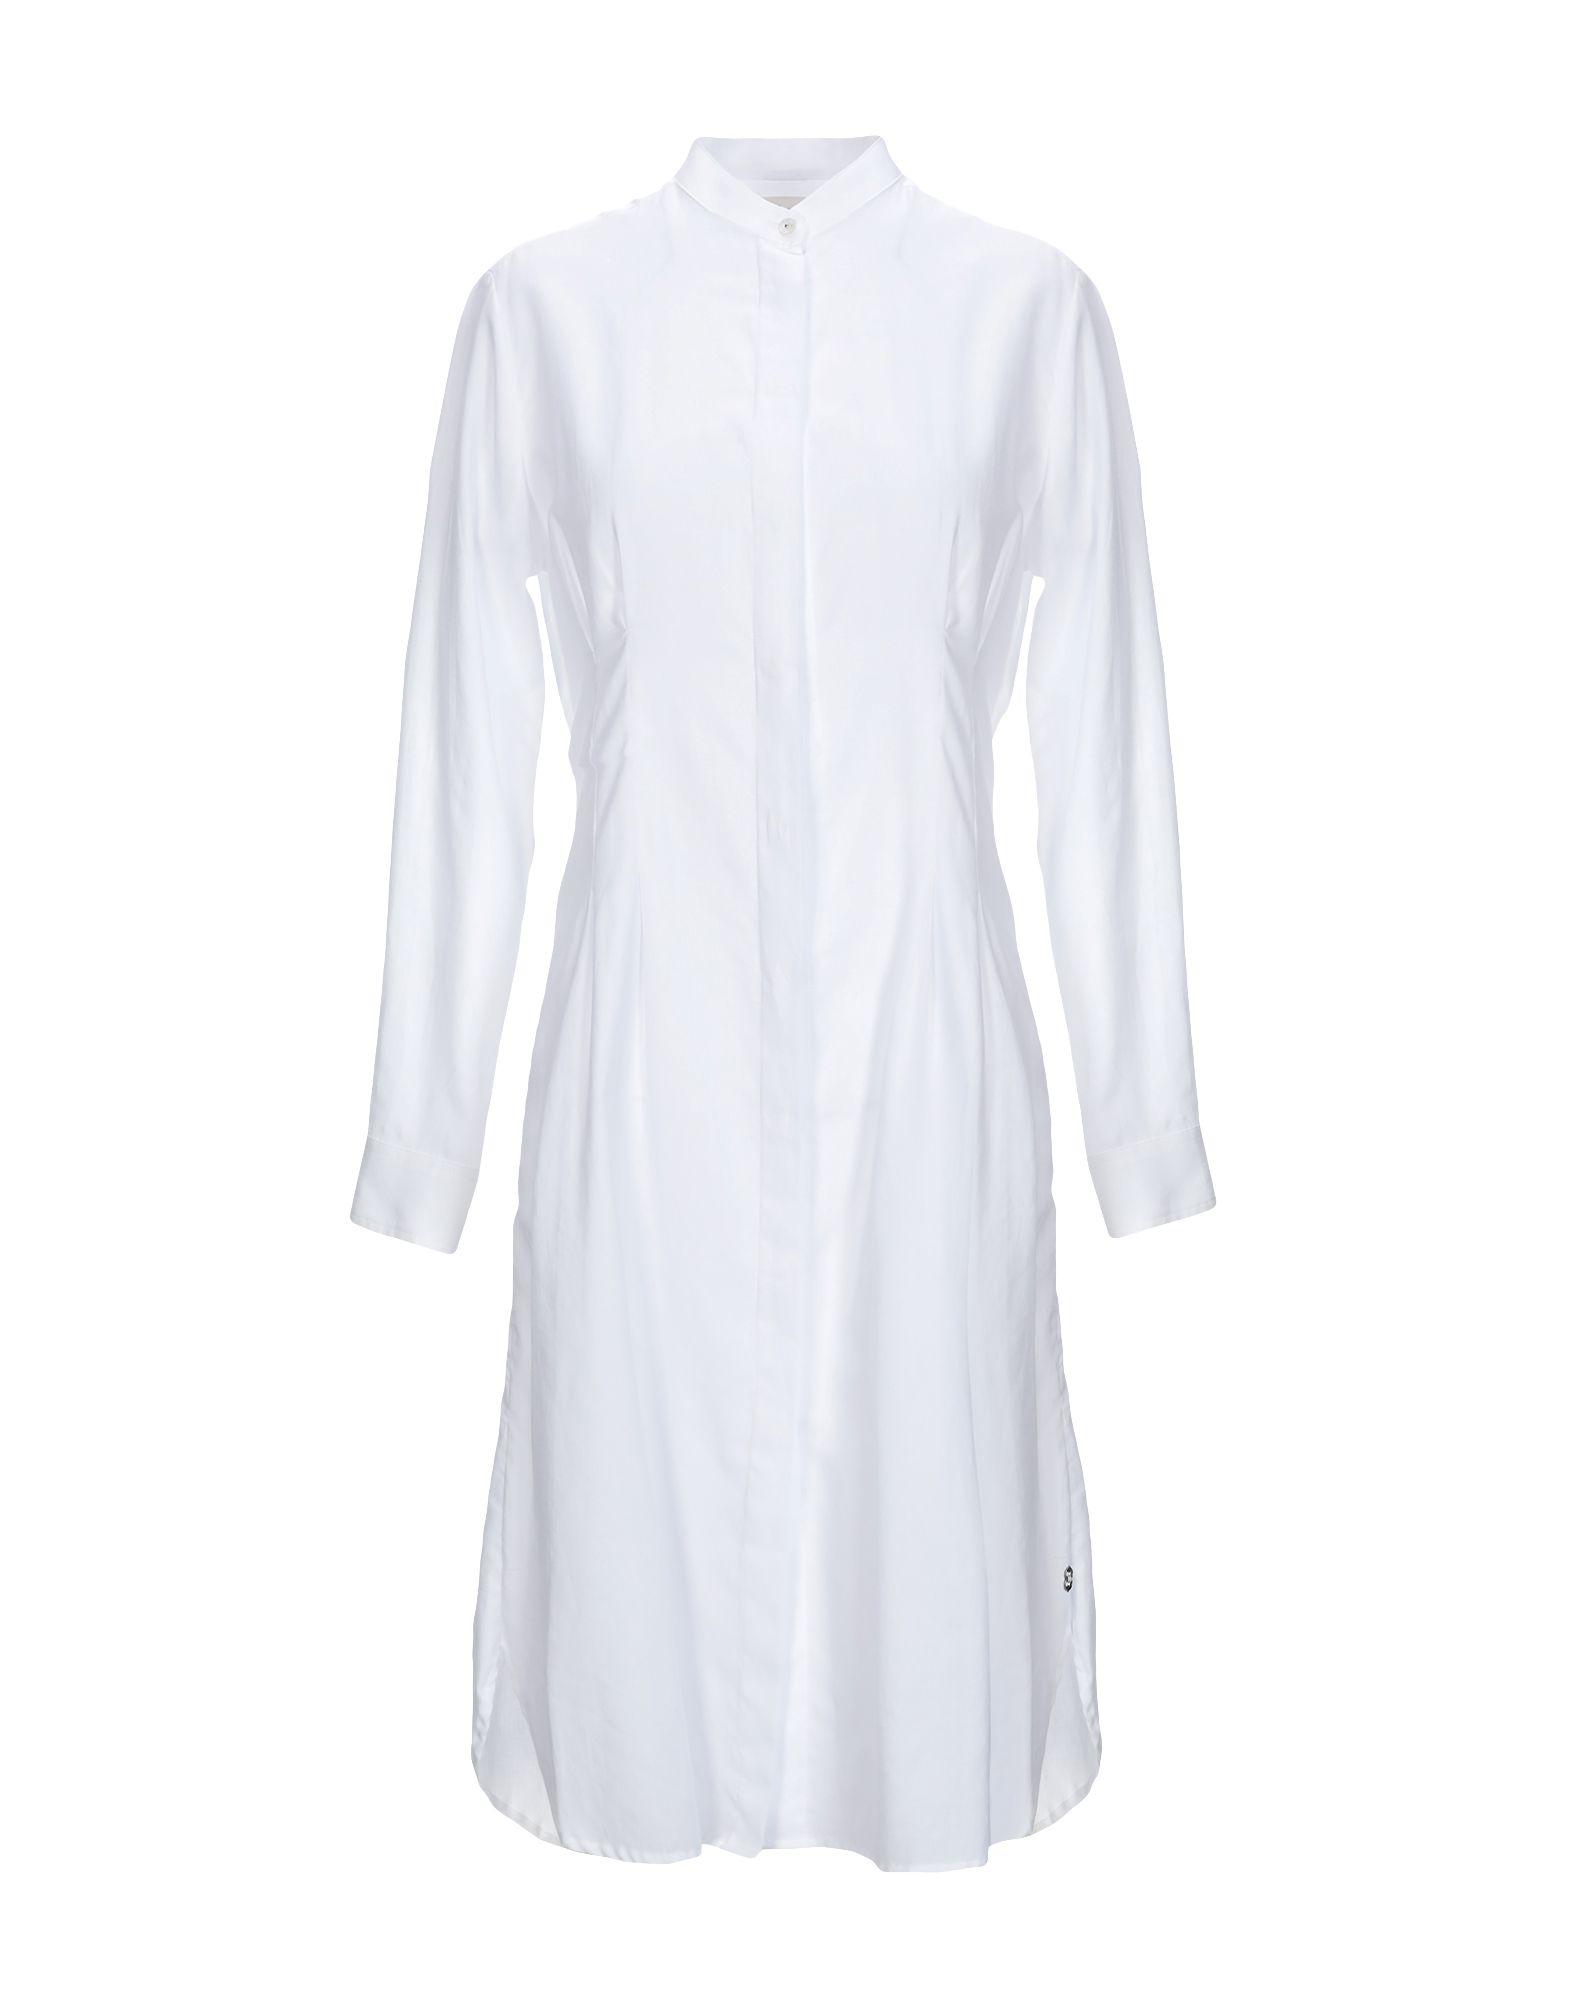 OTTOD'AME Короткое платье платье рубашка fox yulia sway платье рубашка fox